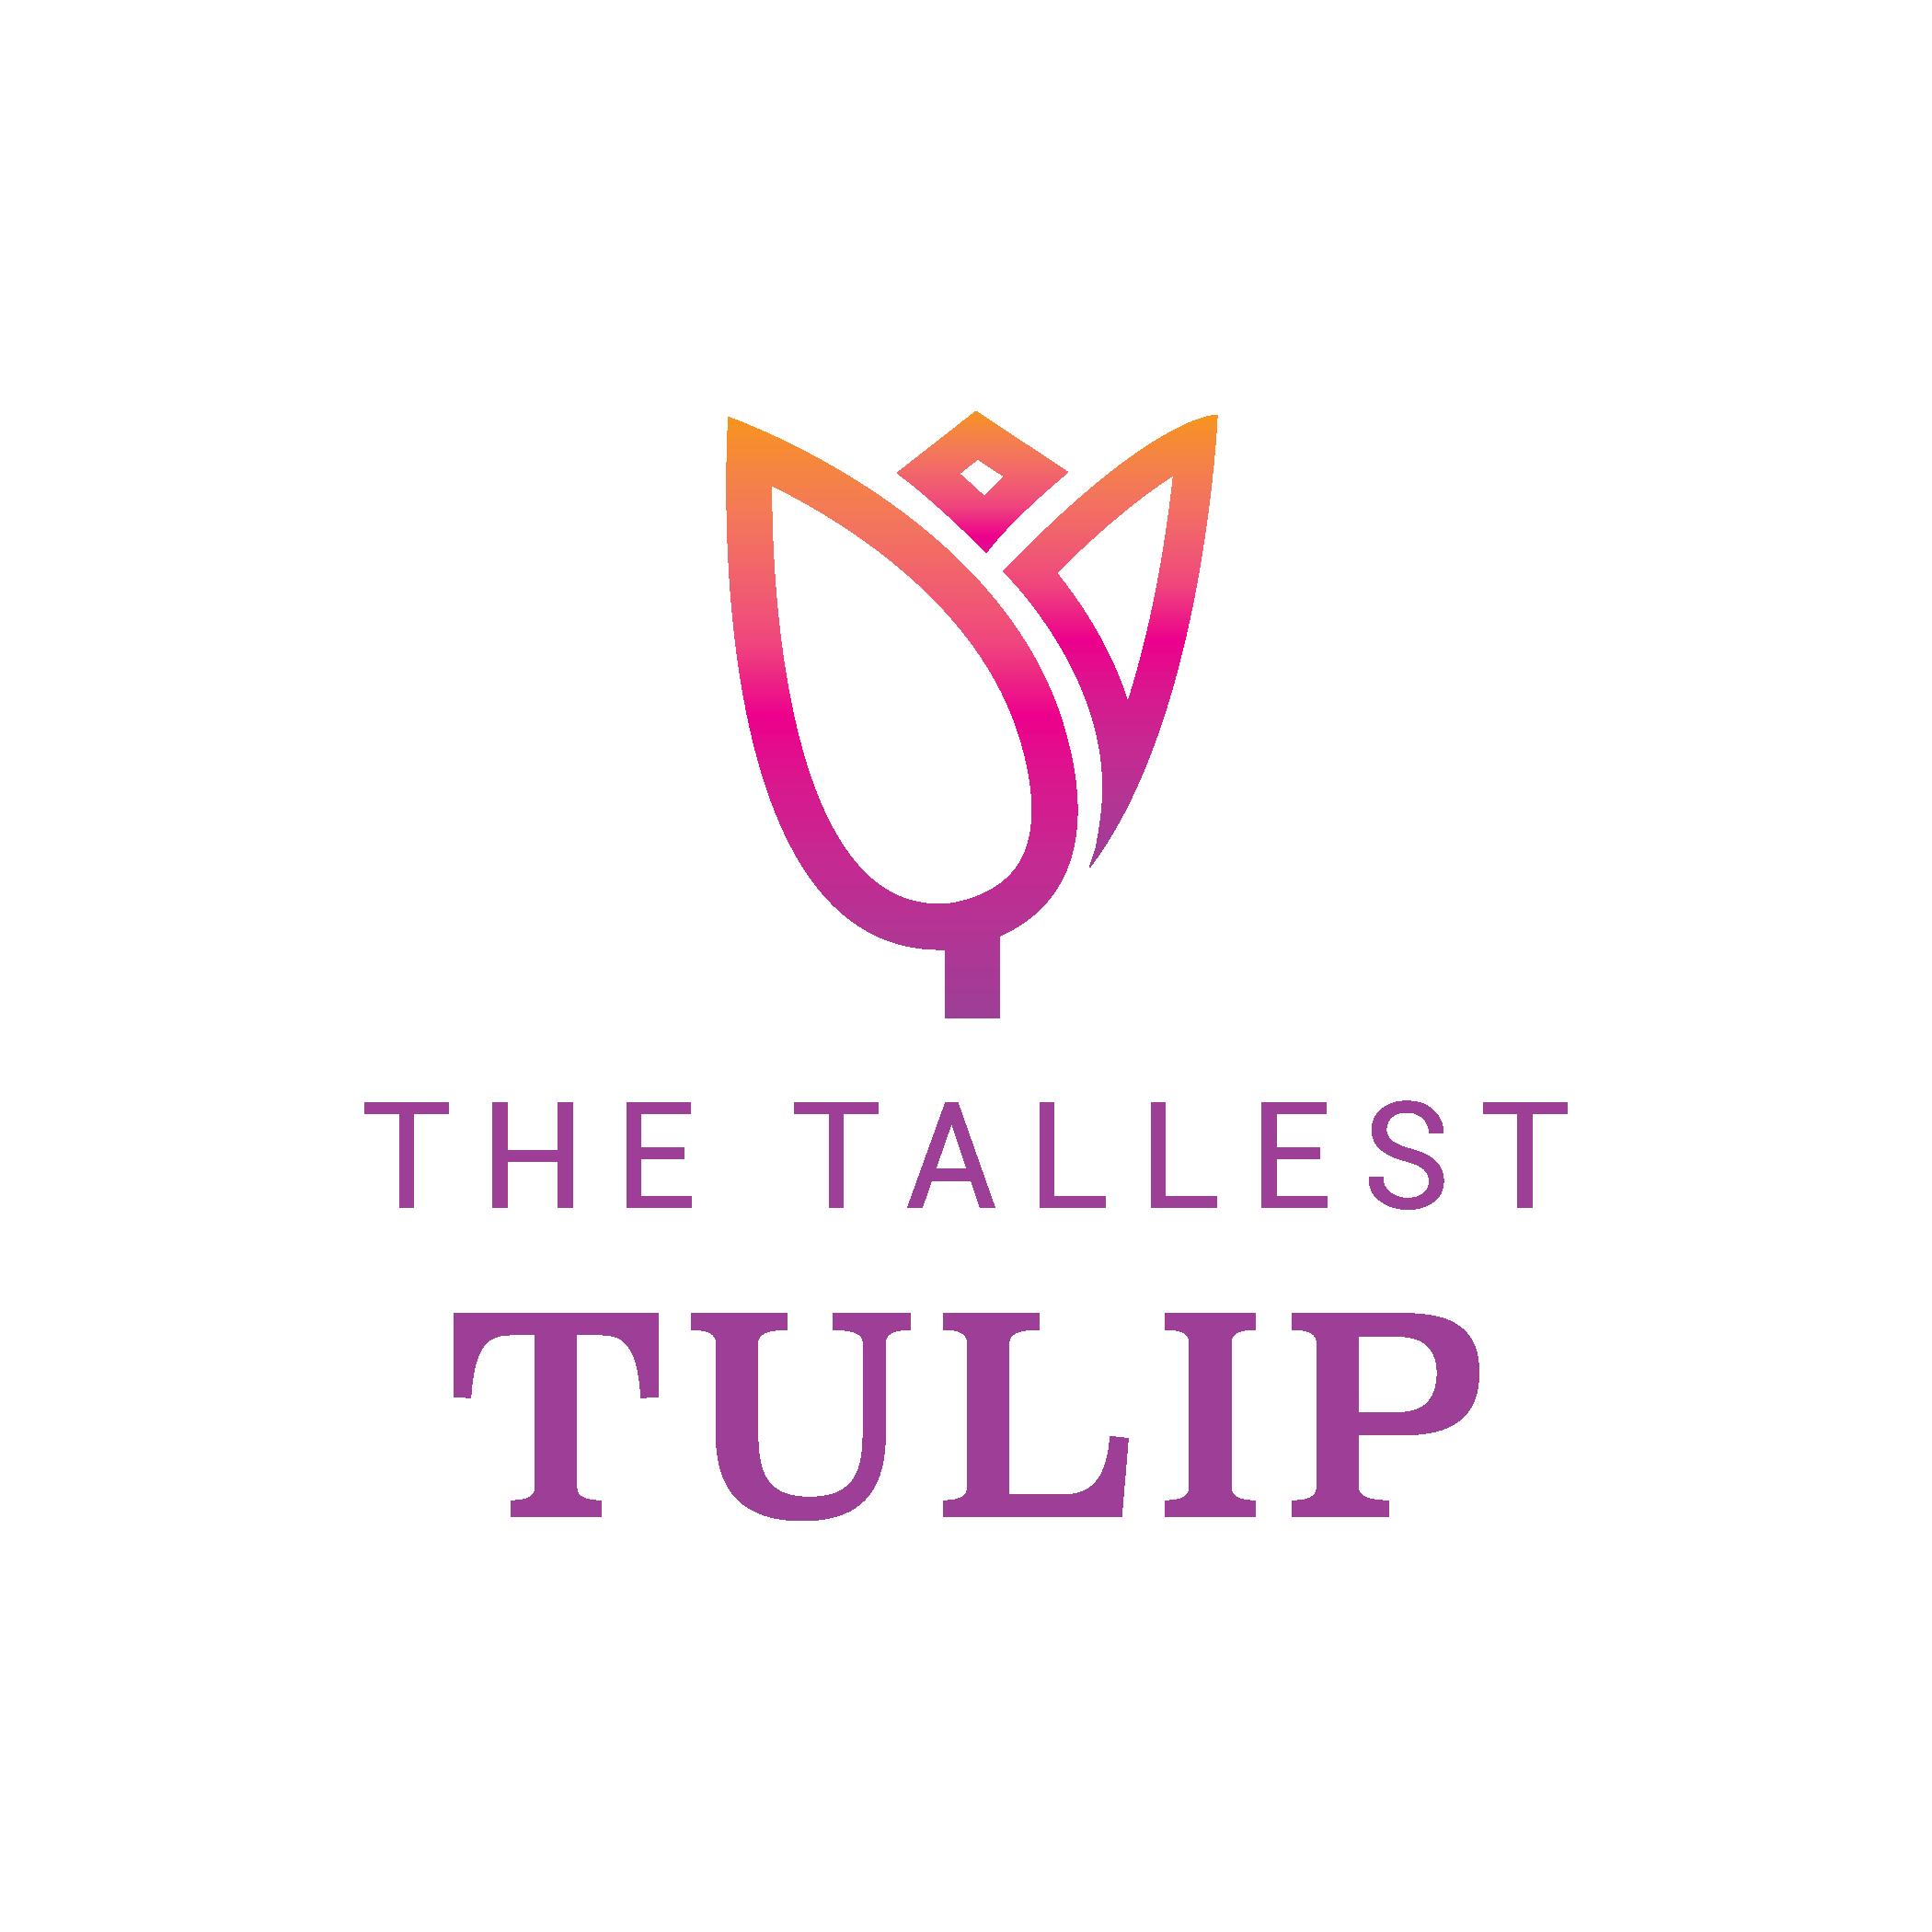 The Tallest Tulip - Houston Floral